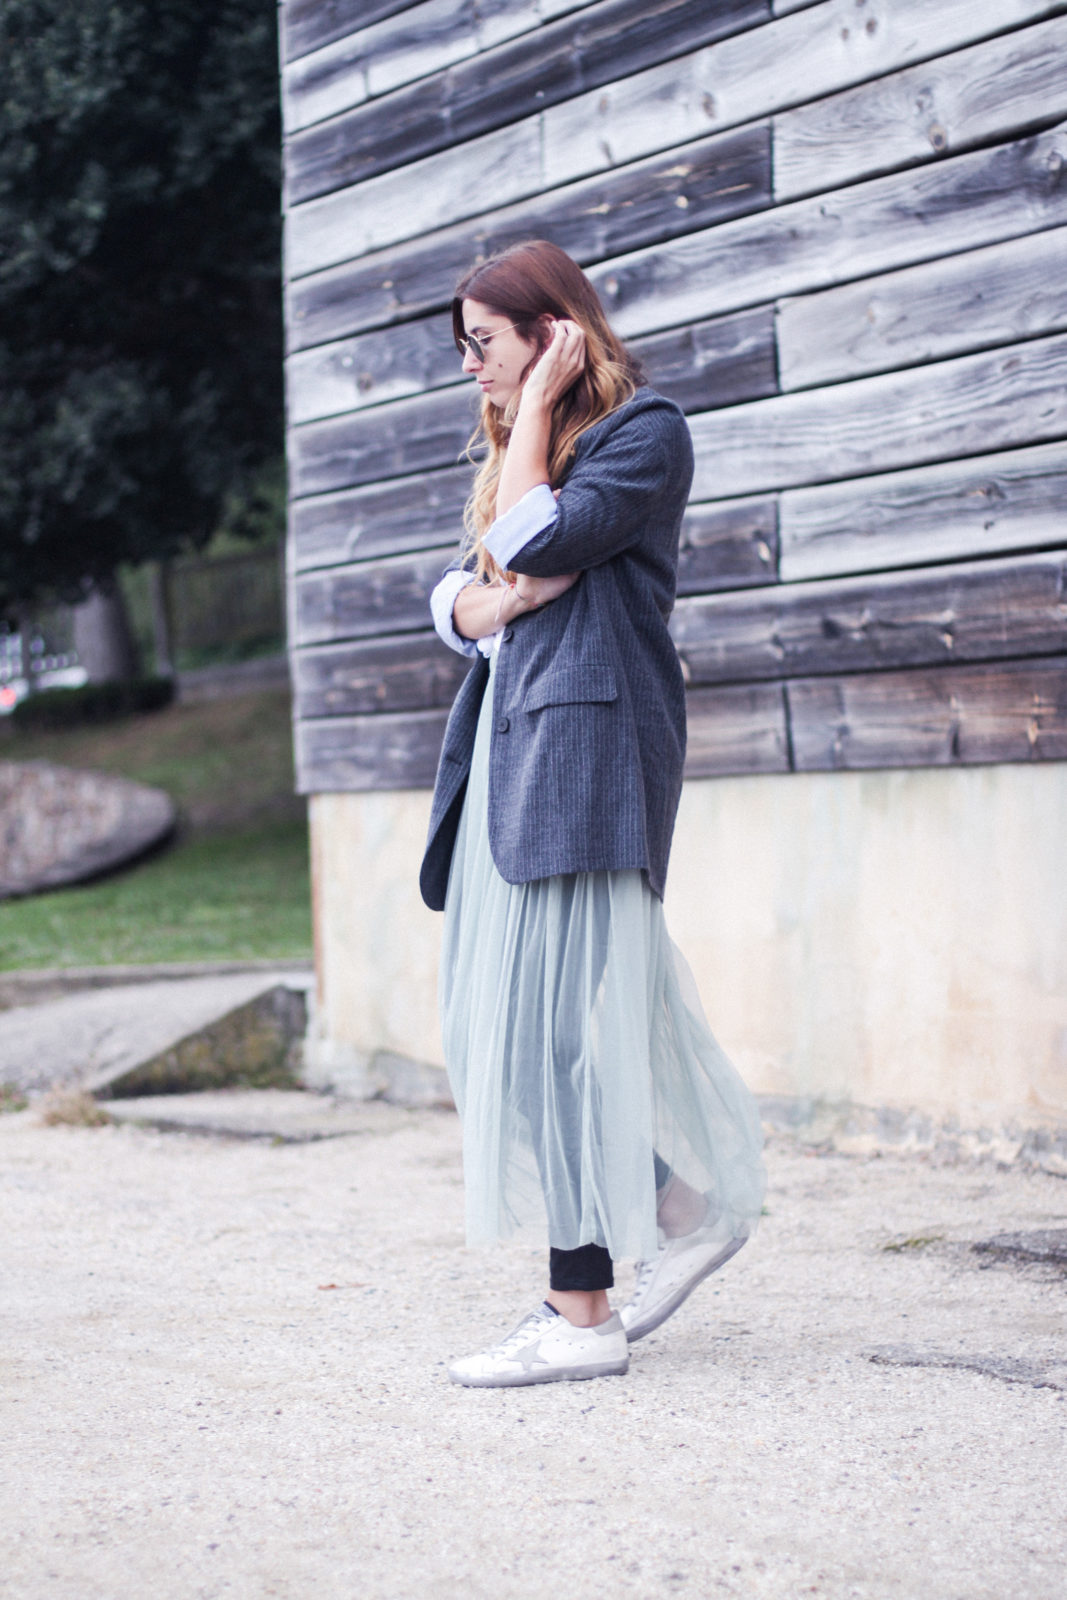 vestido_de_tul_sobre_pantalon_estilo_bailarina_blazer_oversize_pendientes_de_aros_choker_tendencias_trends_fall_2016_street_style_donkeycool-11